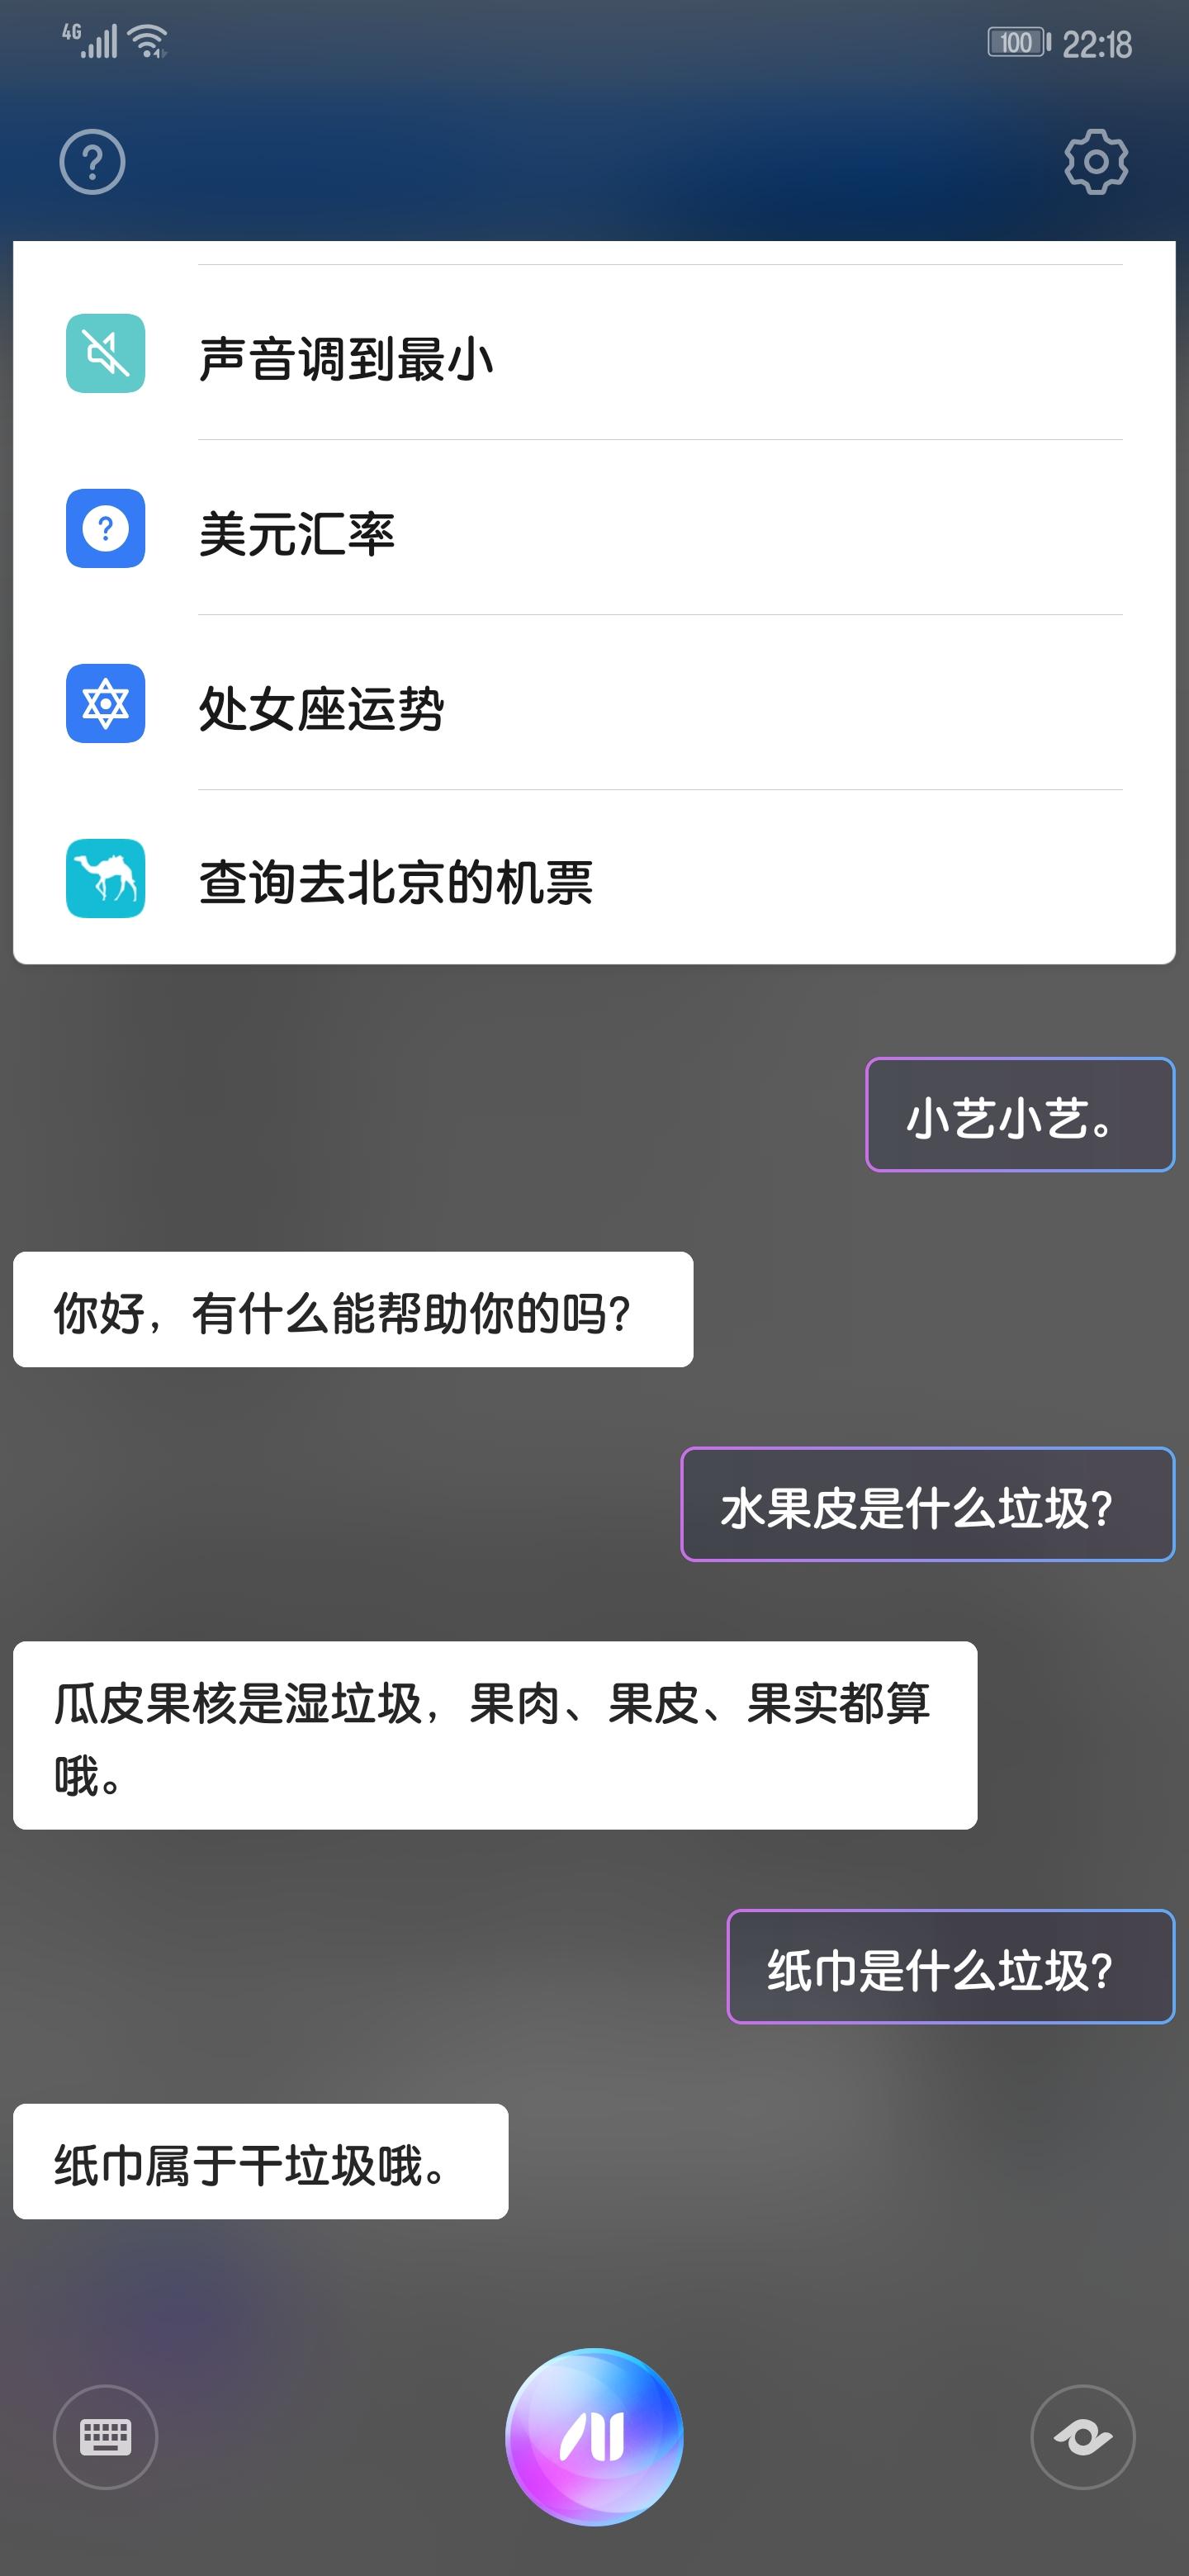 Screenshot_20190717_221837_com.huawei.vassistant.jpg